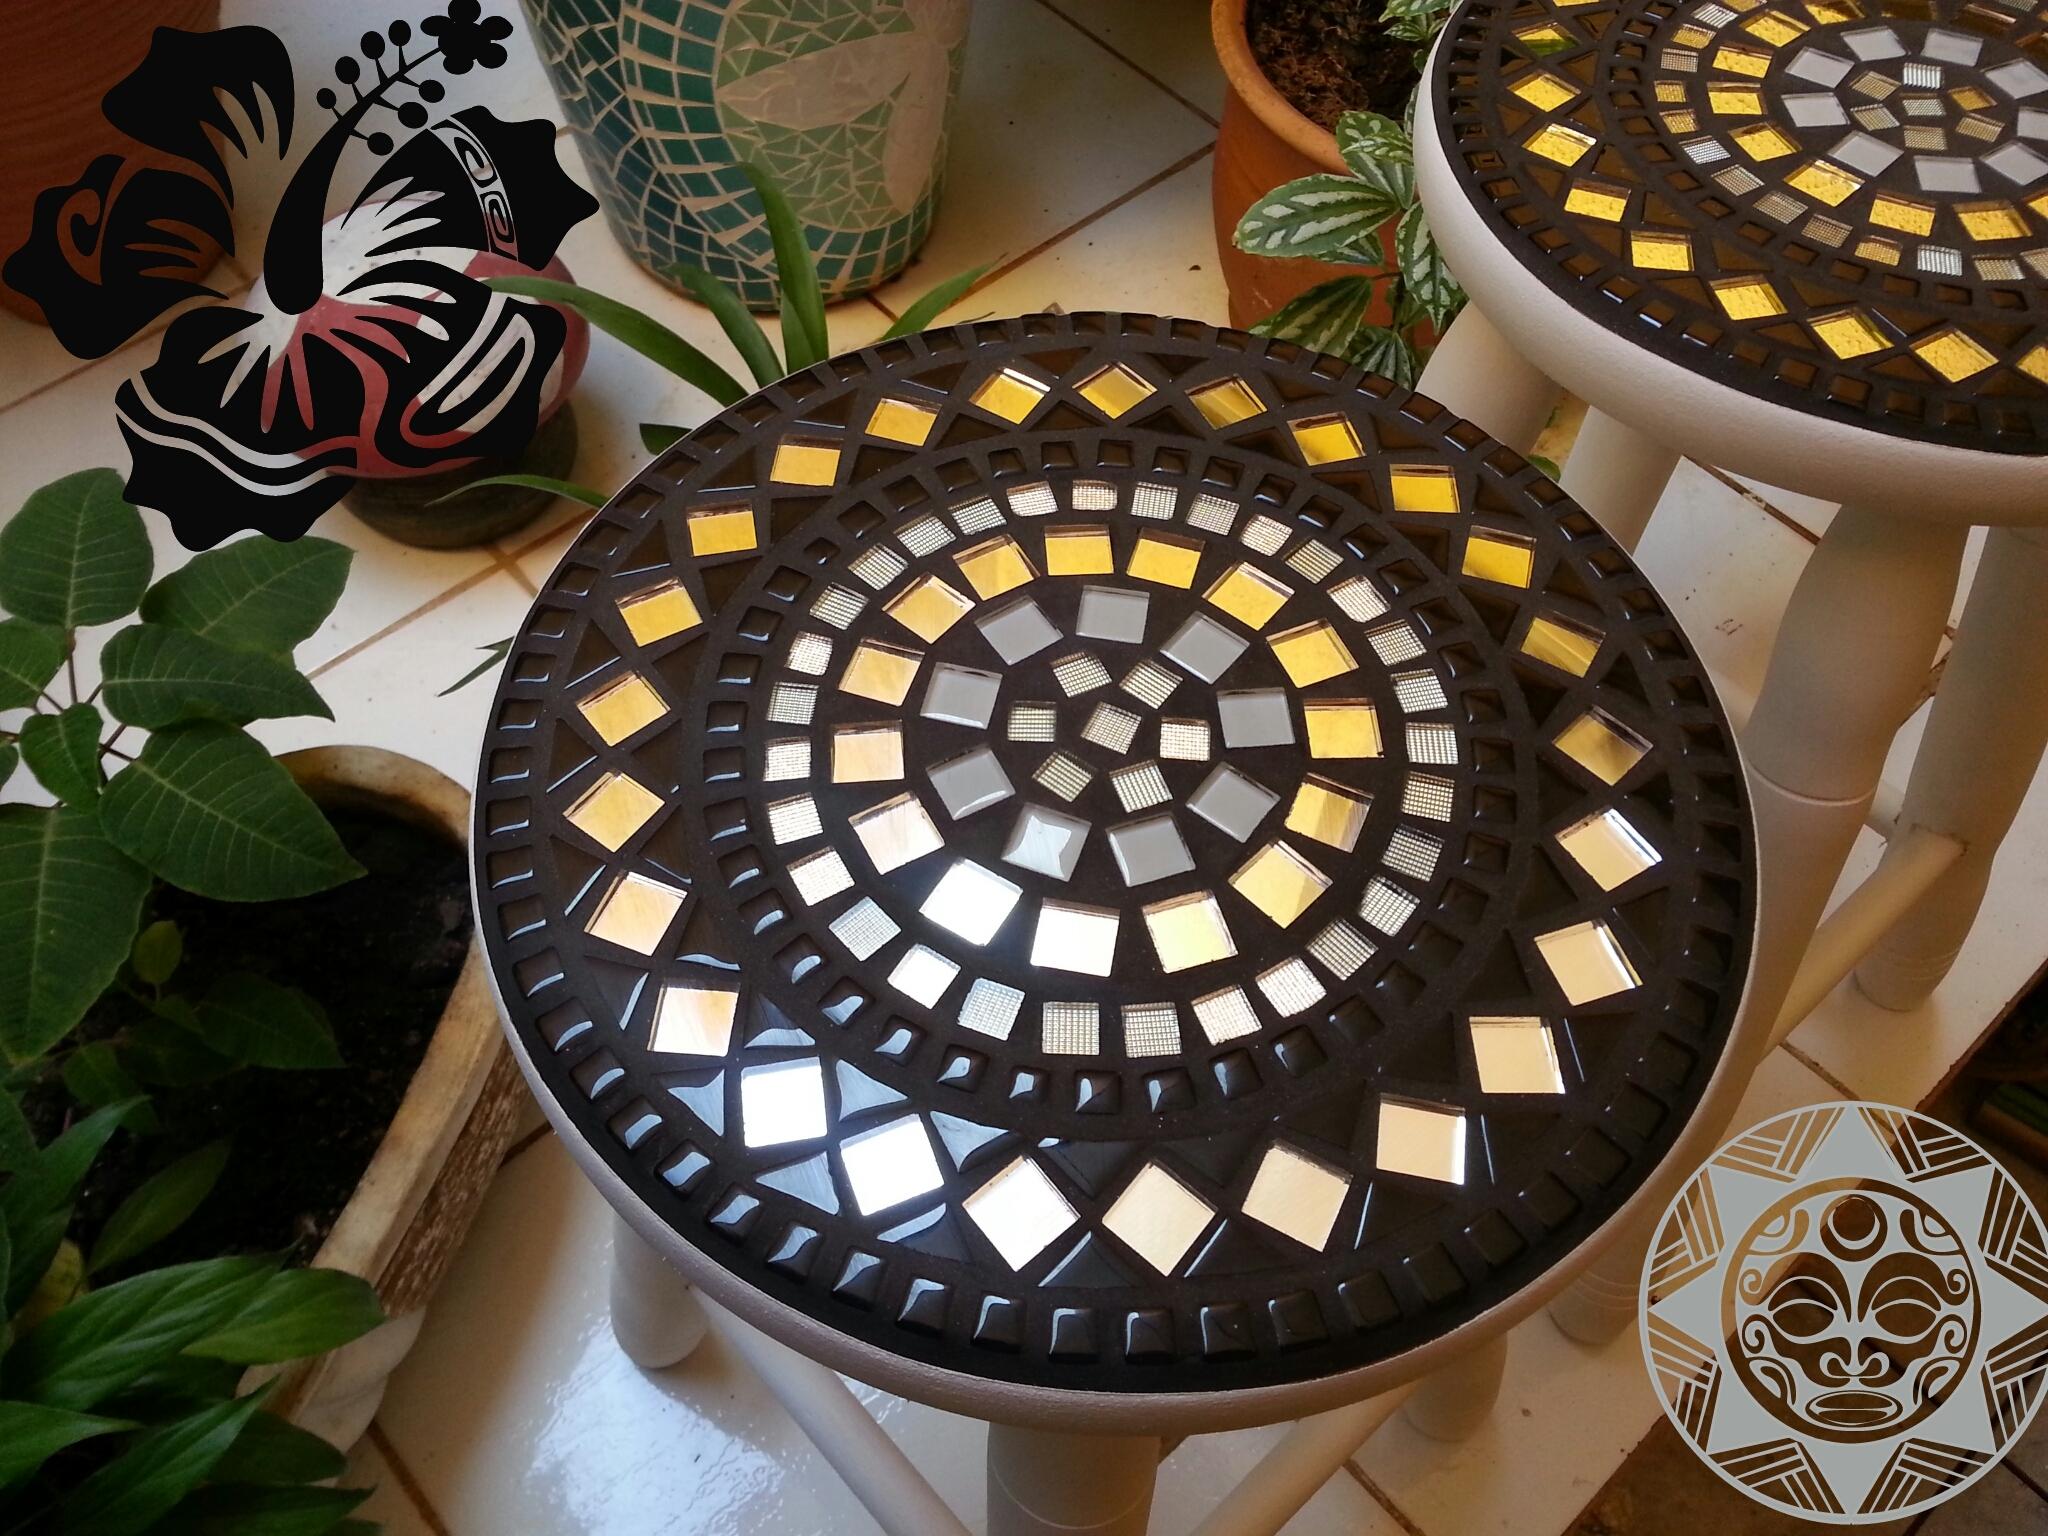 banqueta de madeira banco mosaico personalizado pintado banqueta de  #BB8F10 2048x1536